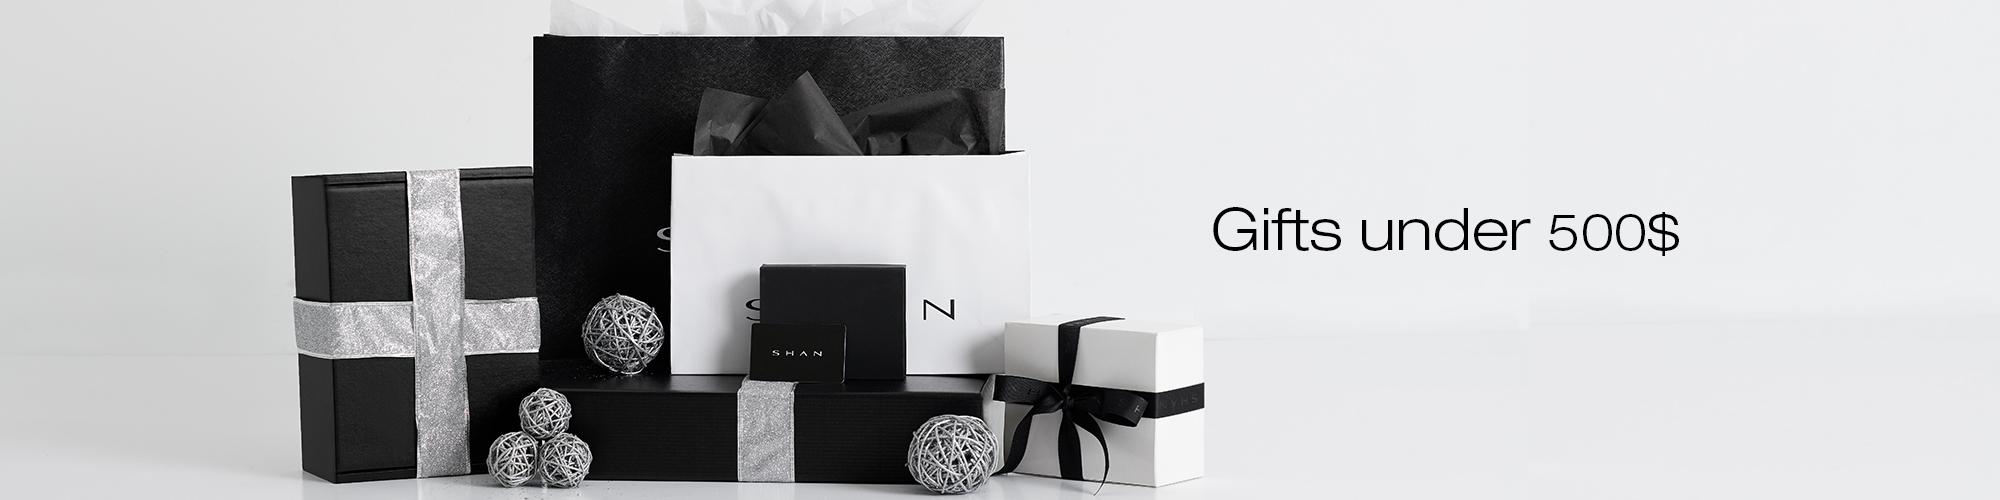 Gifts under 500$